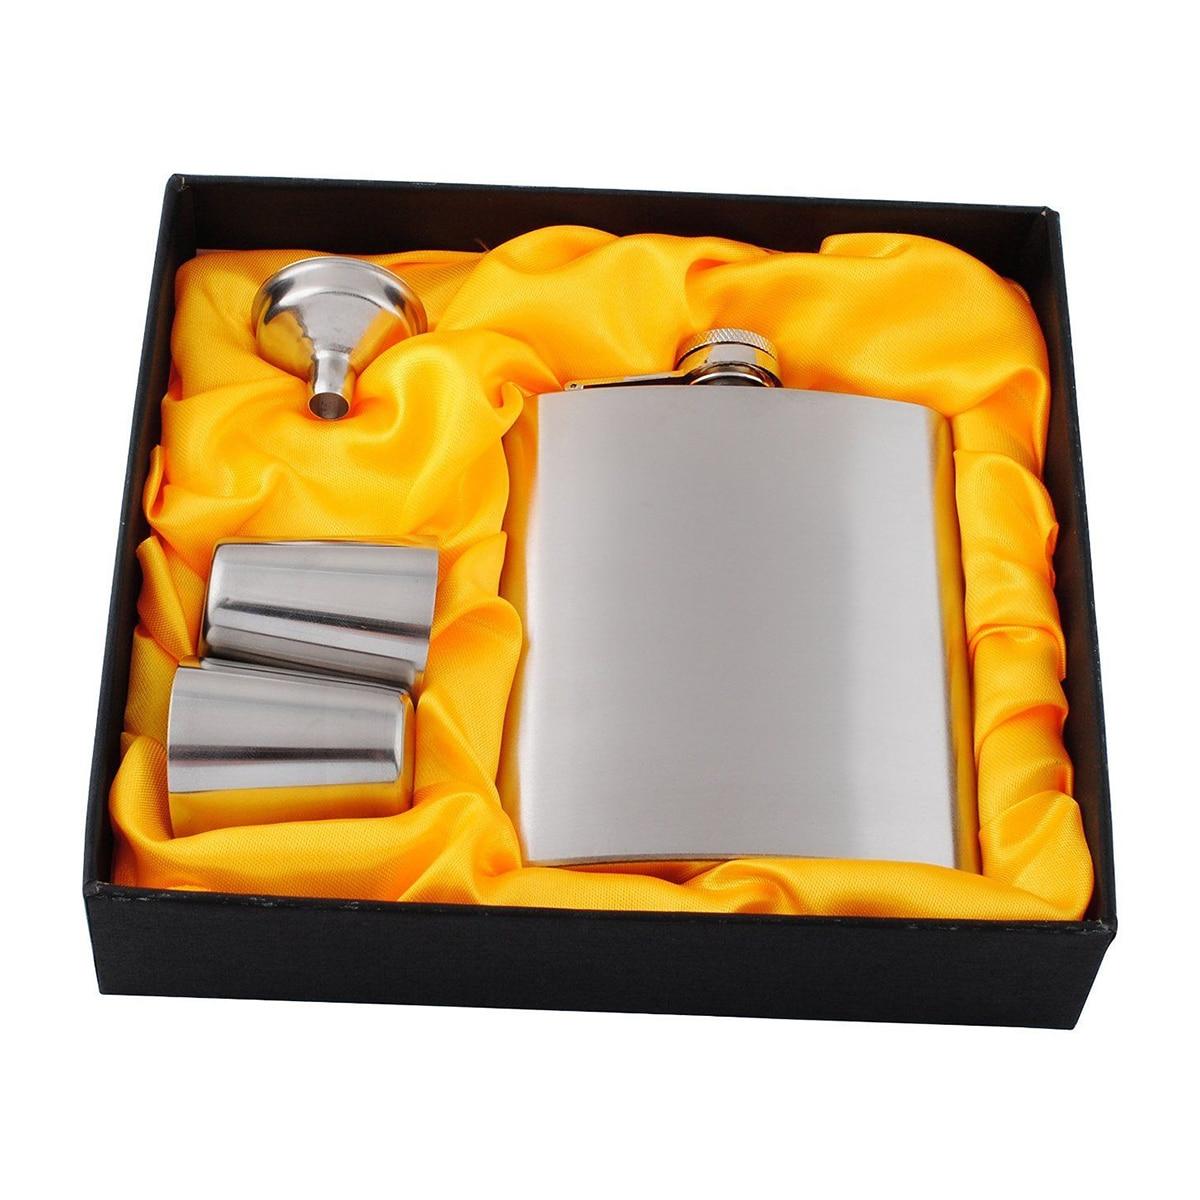 Hip Flask 7oz Stainless Steel Pocket Alcohol Drink Whisky Vodka Shots Portable